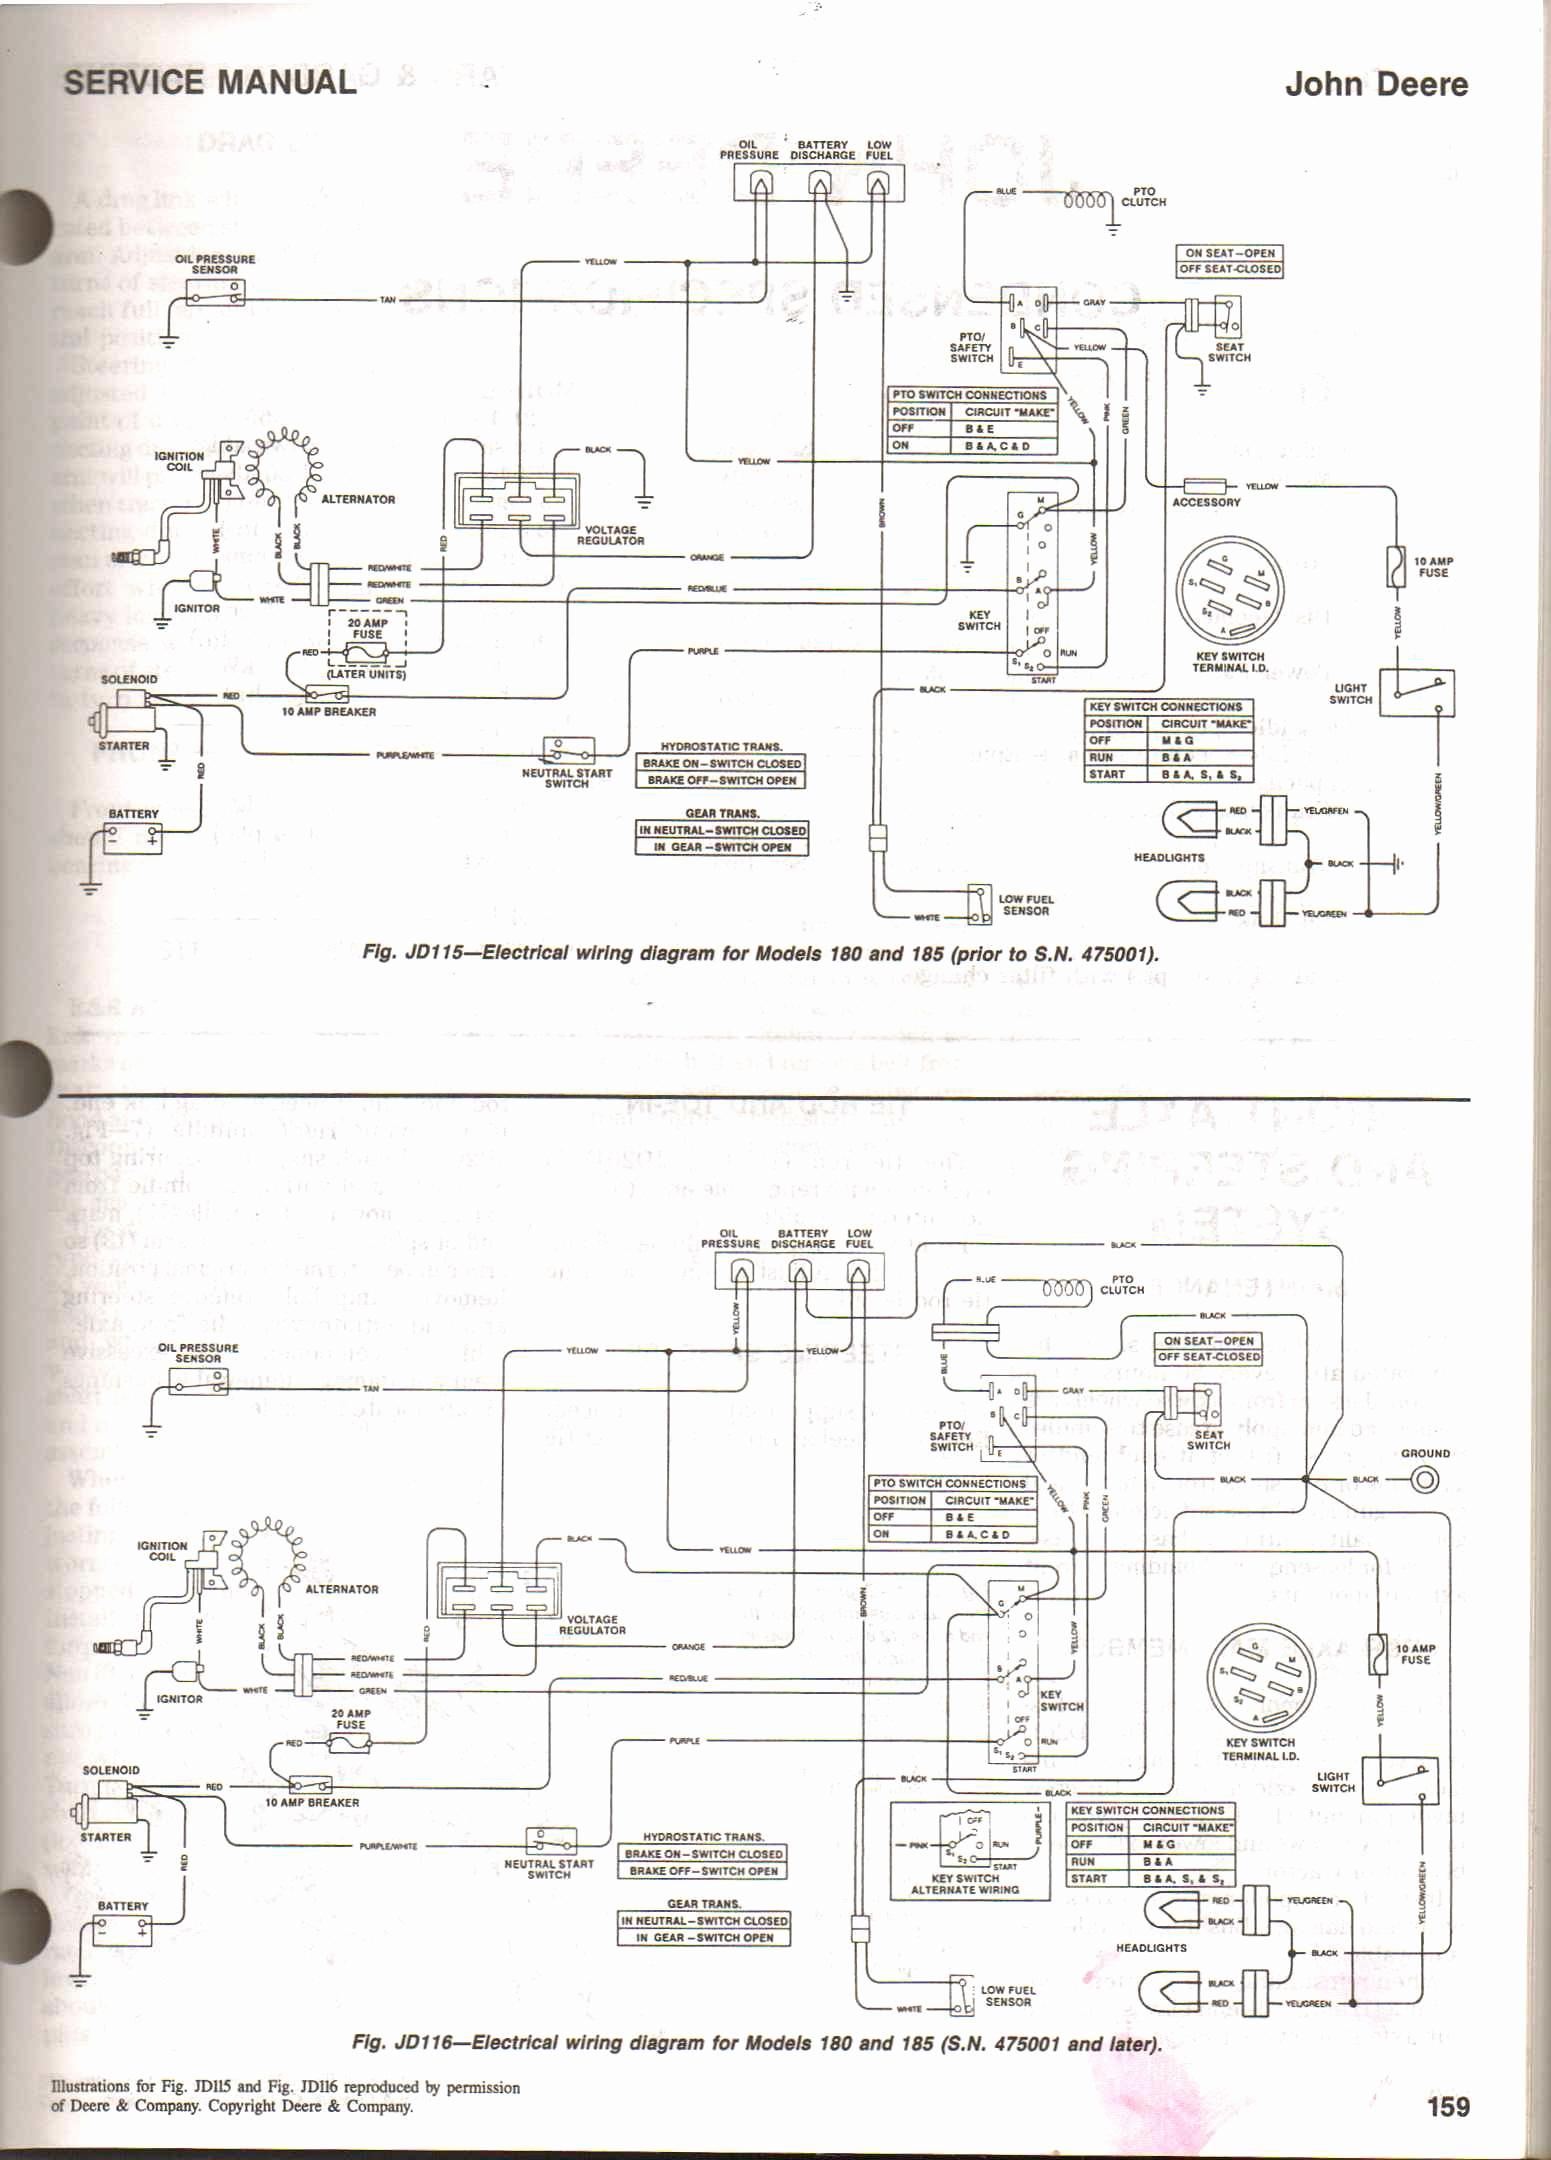 hight resolution of john deere l130 wiring diagram john deere d105 parts diagram for john deere l130 wiring